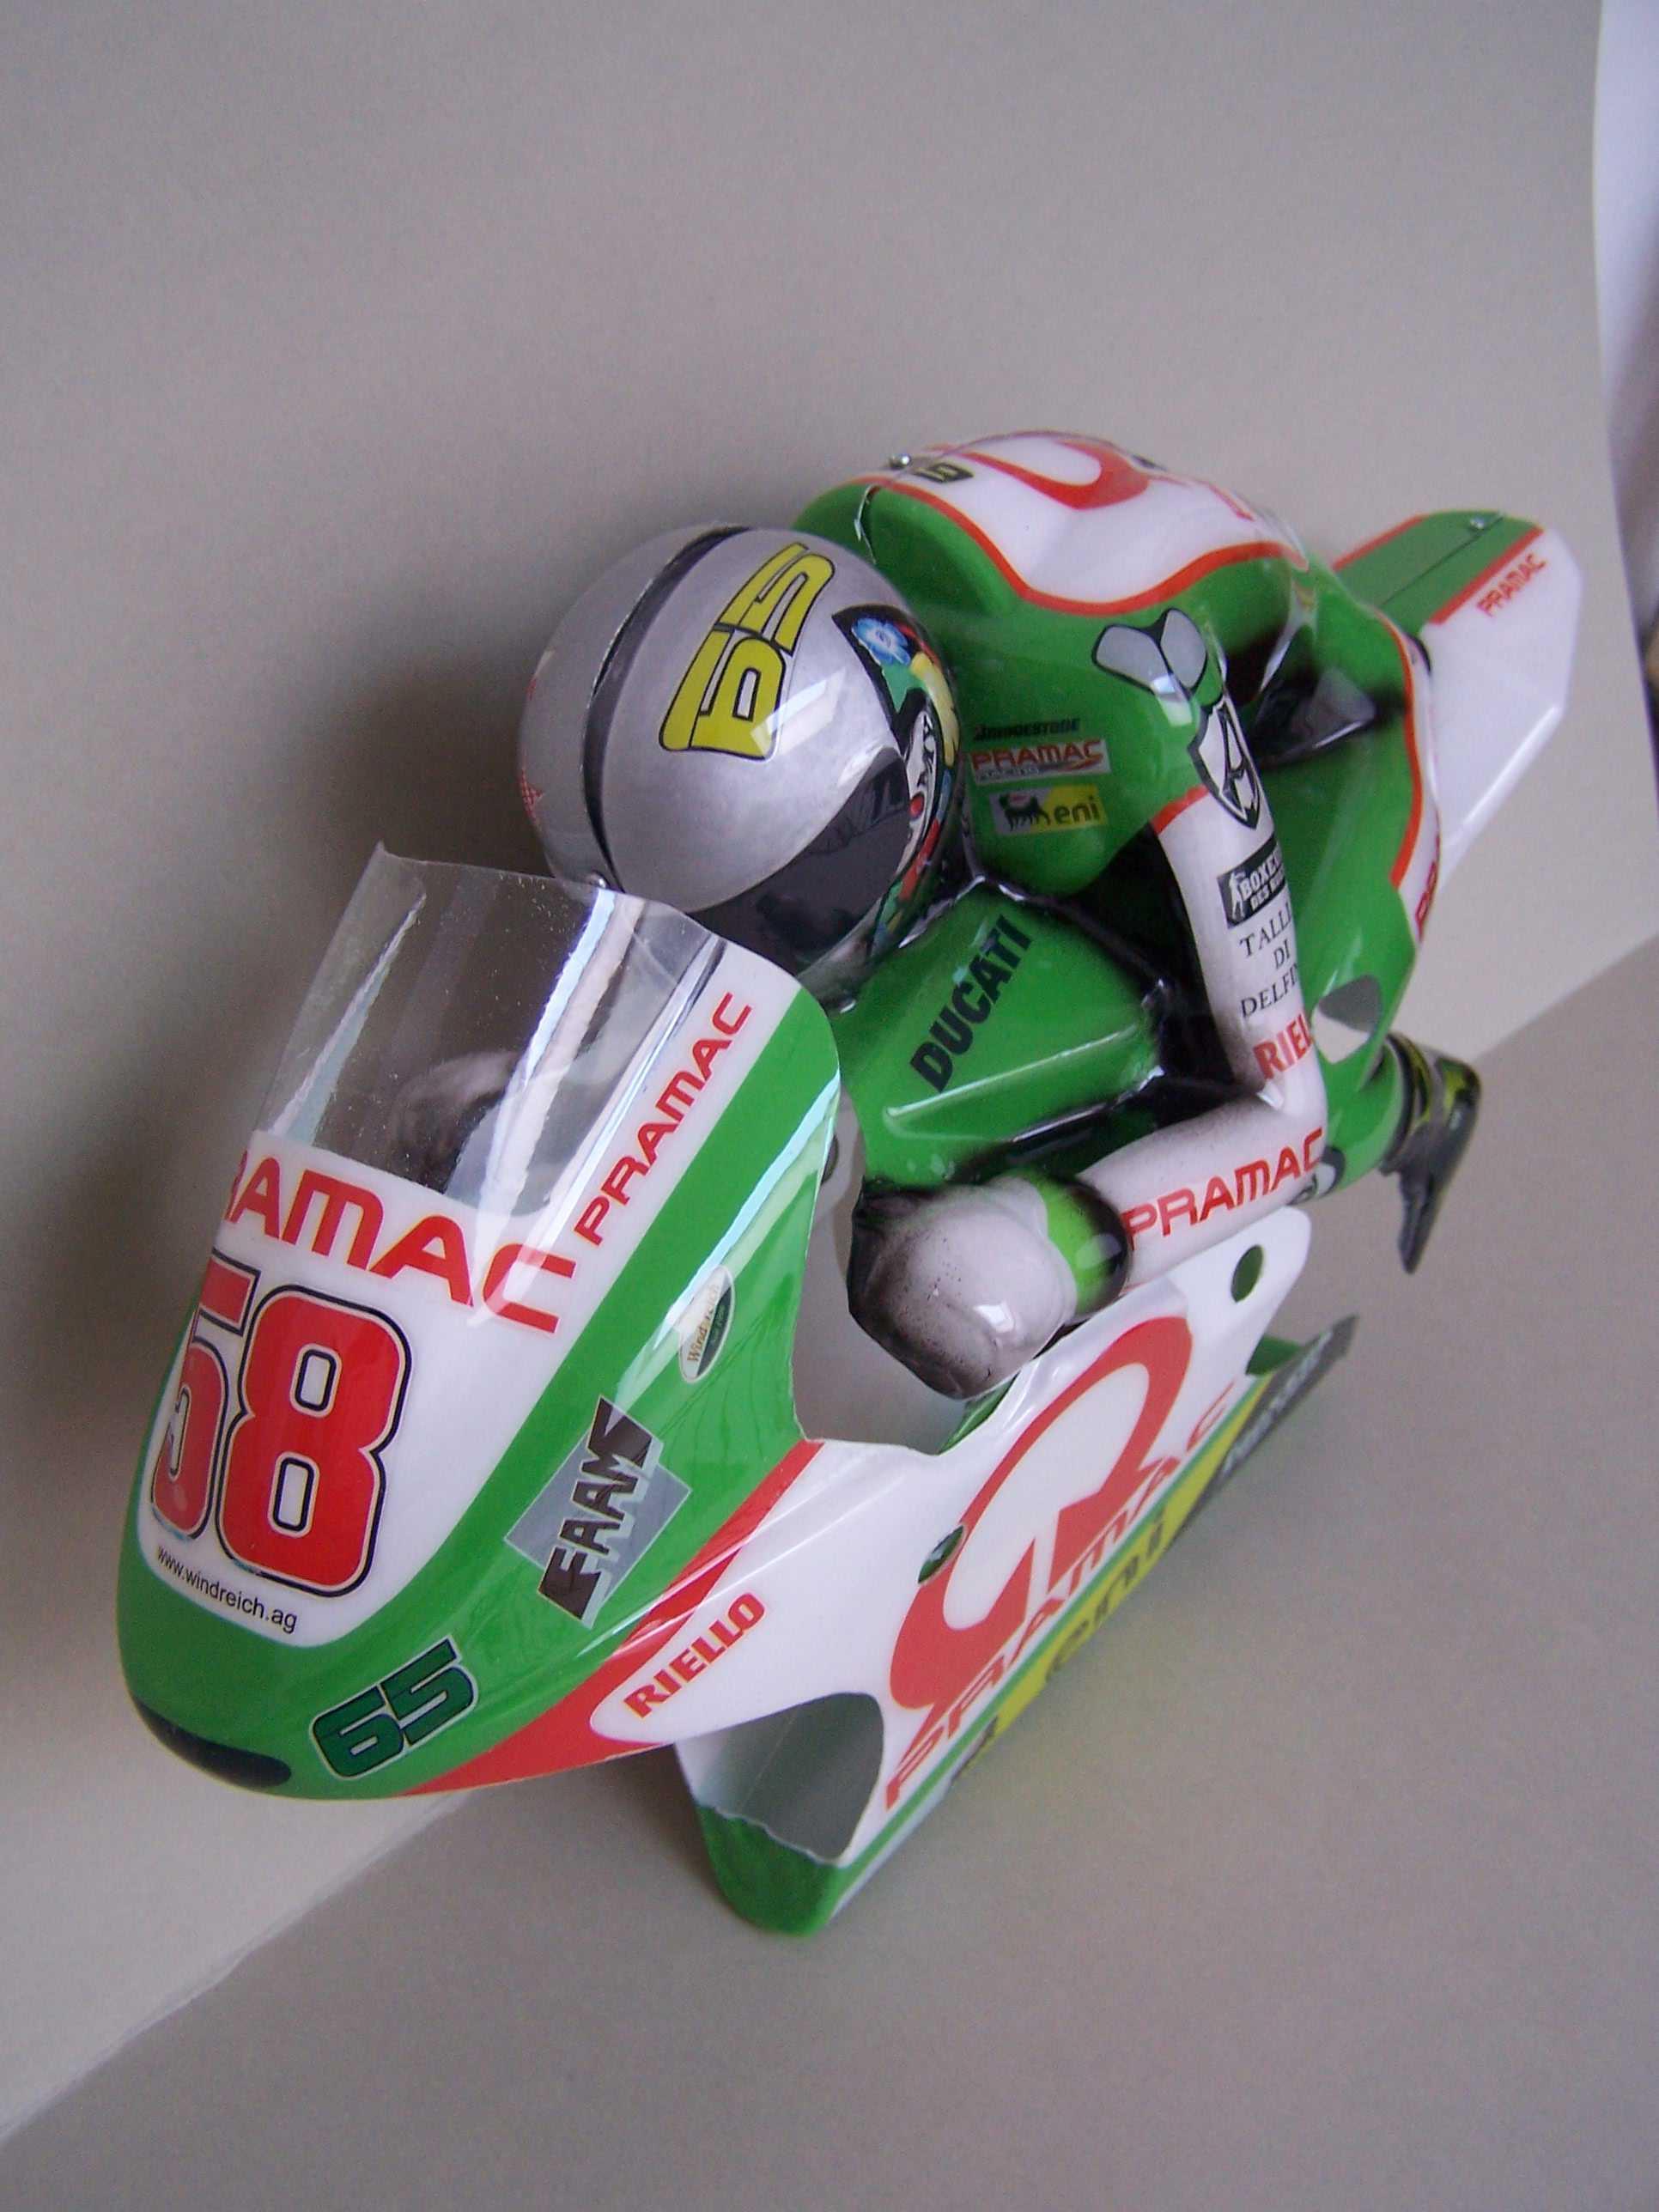 [Pramac-Ducati-Capirossi.jpgru_.jpg]